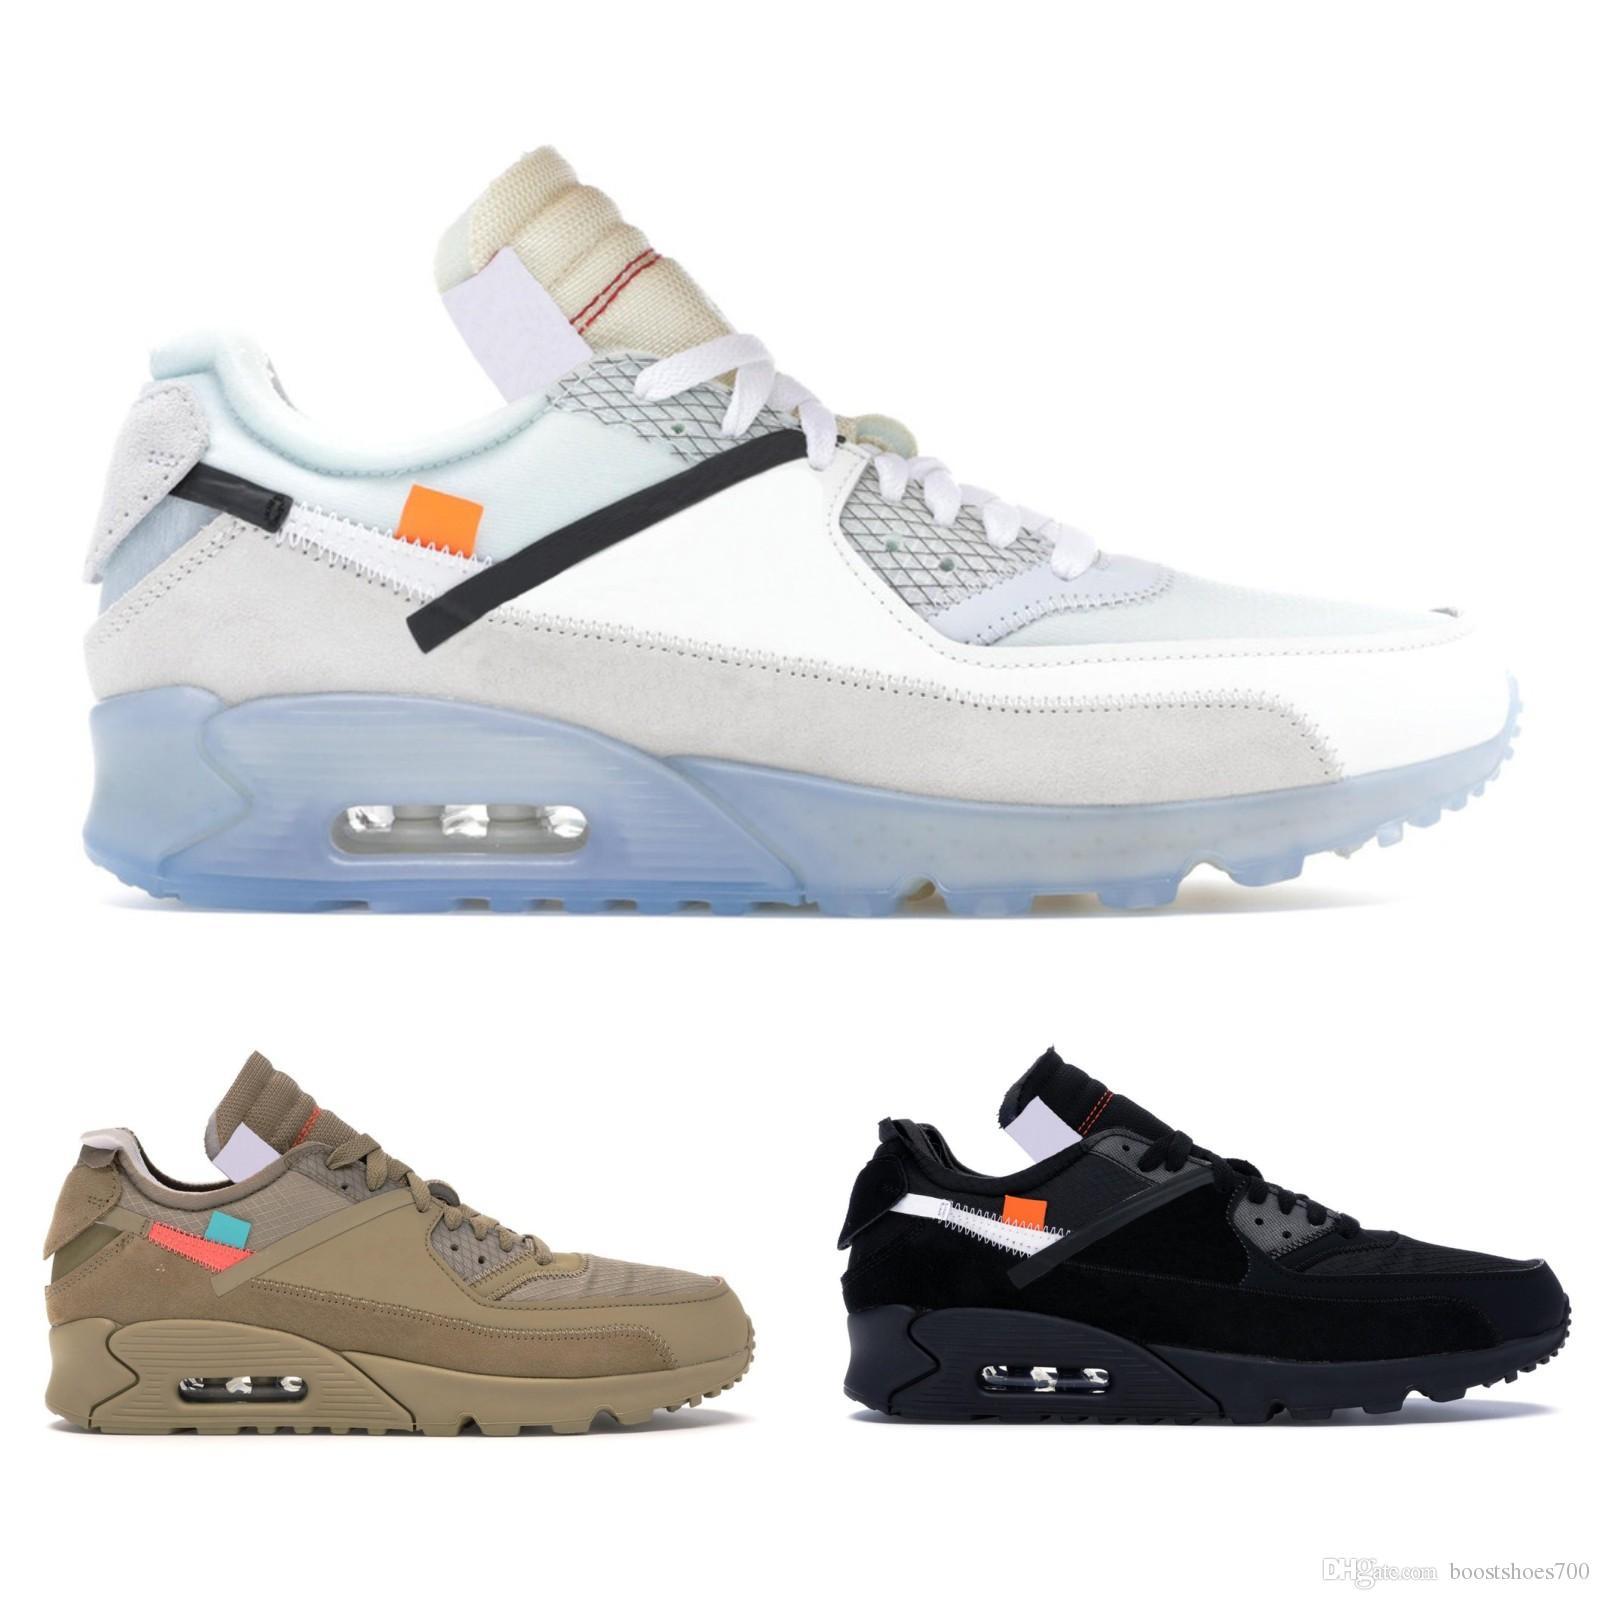 low priced 7bc7d cd8df Brand New 90 Desert Ore Mens Designer Schuhe Schwarz Weiß Laufschuhe Top  Männer Frauen 90er Jahre Sport Sneakers Größe 40-45